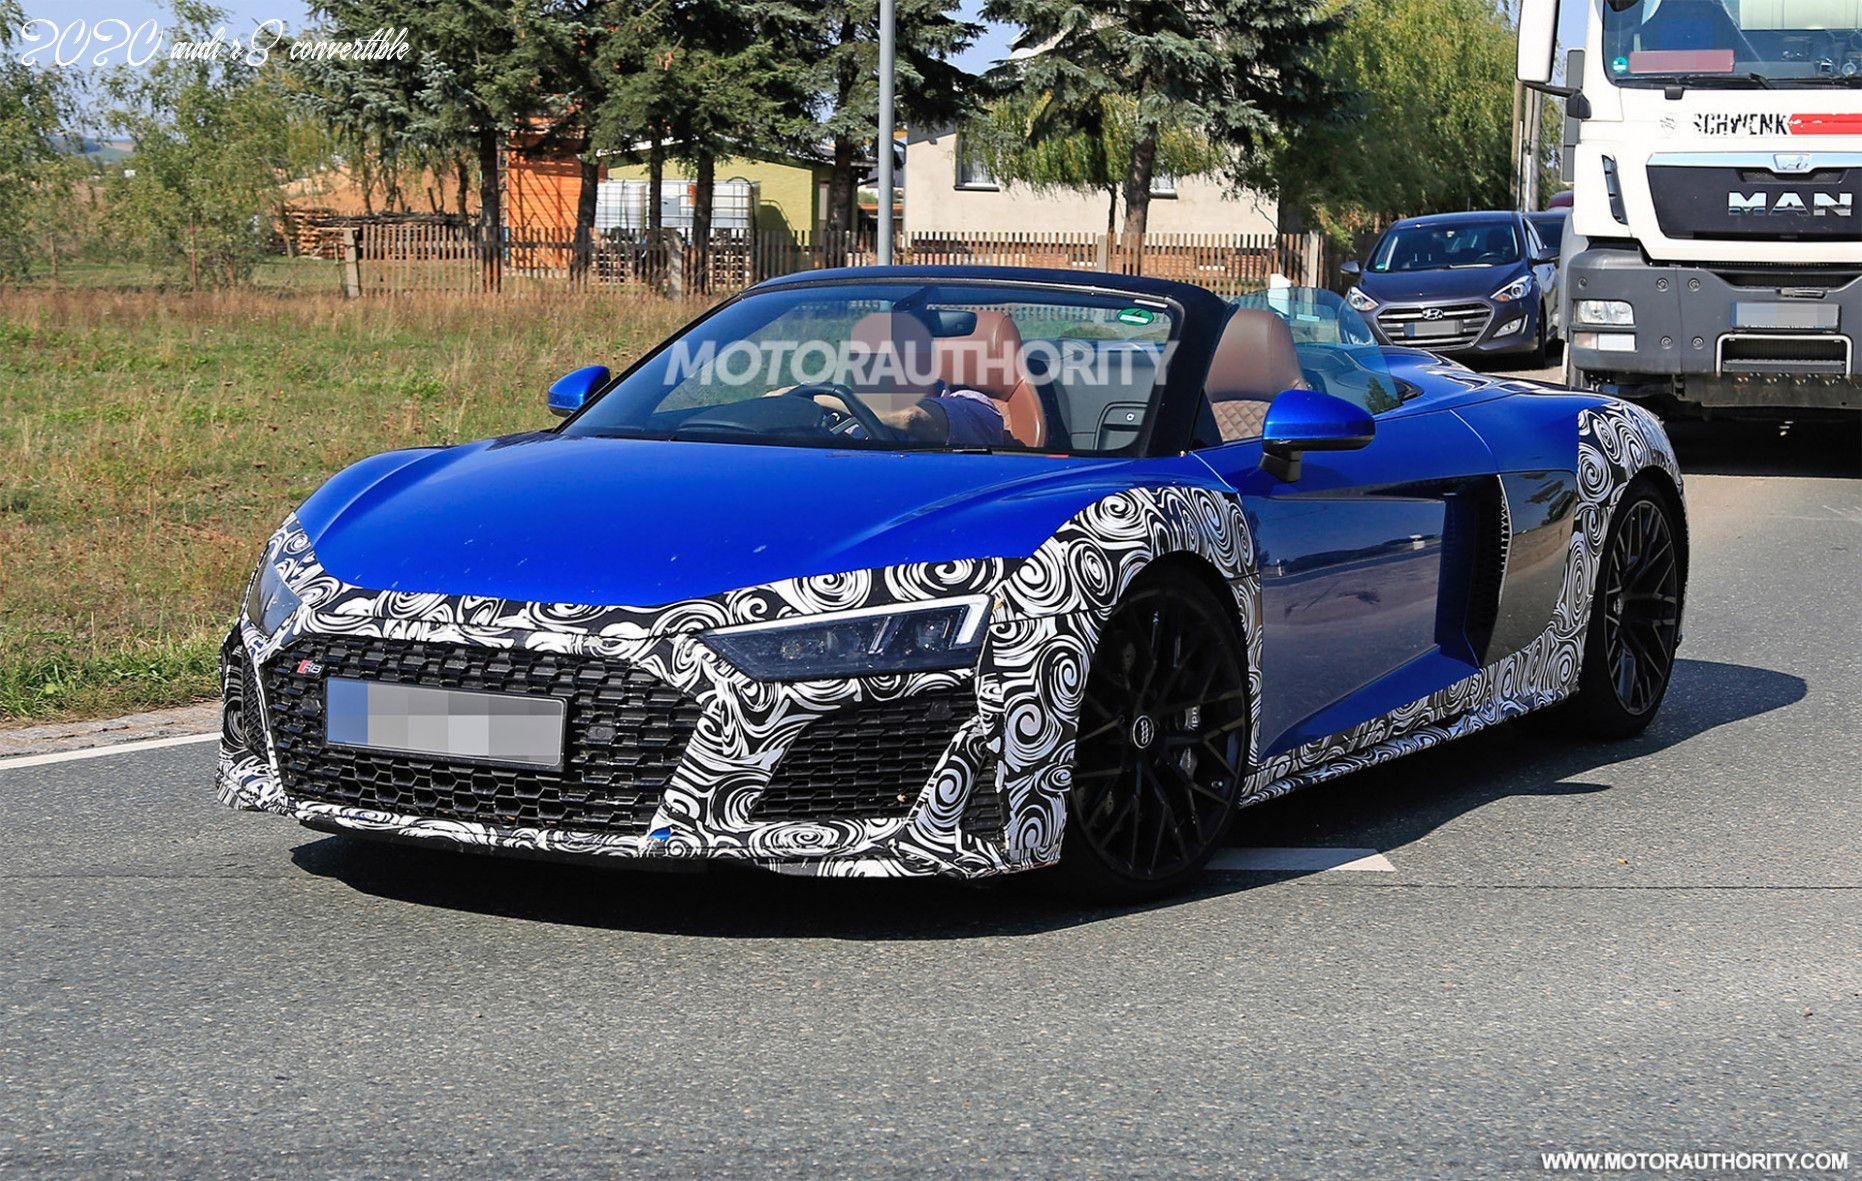 2020 Audi R8 Convertible In 2020 Audi R8 V10 Audi R8 Audi R8 Convertible